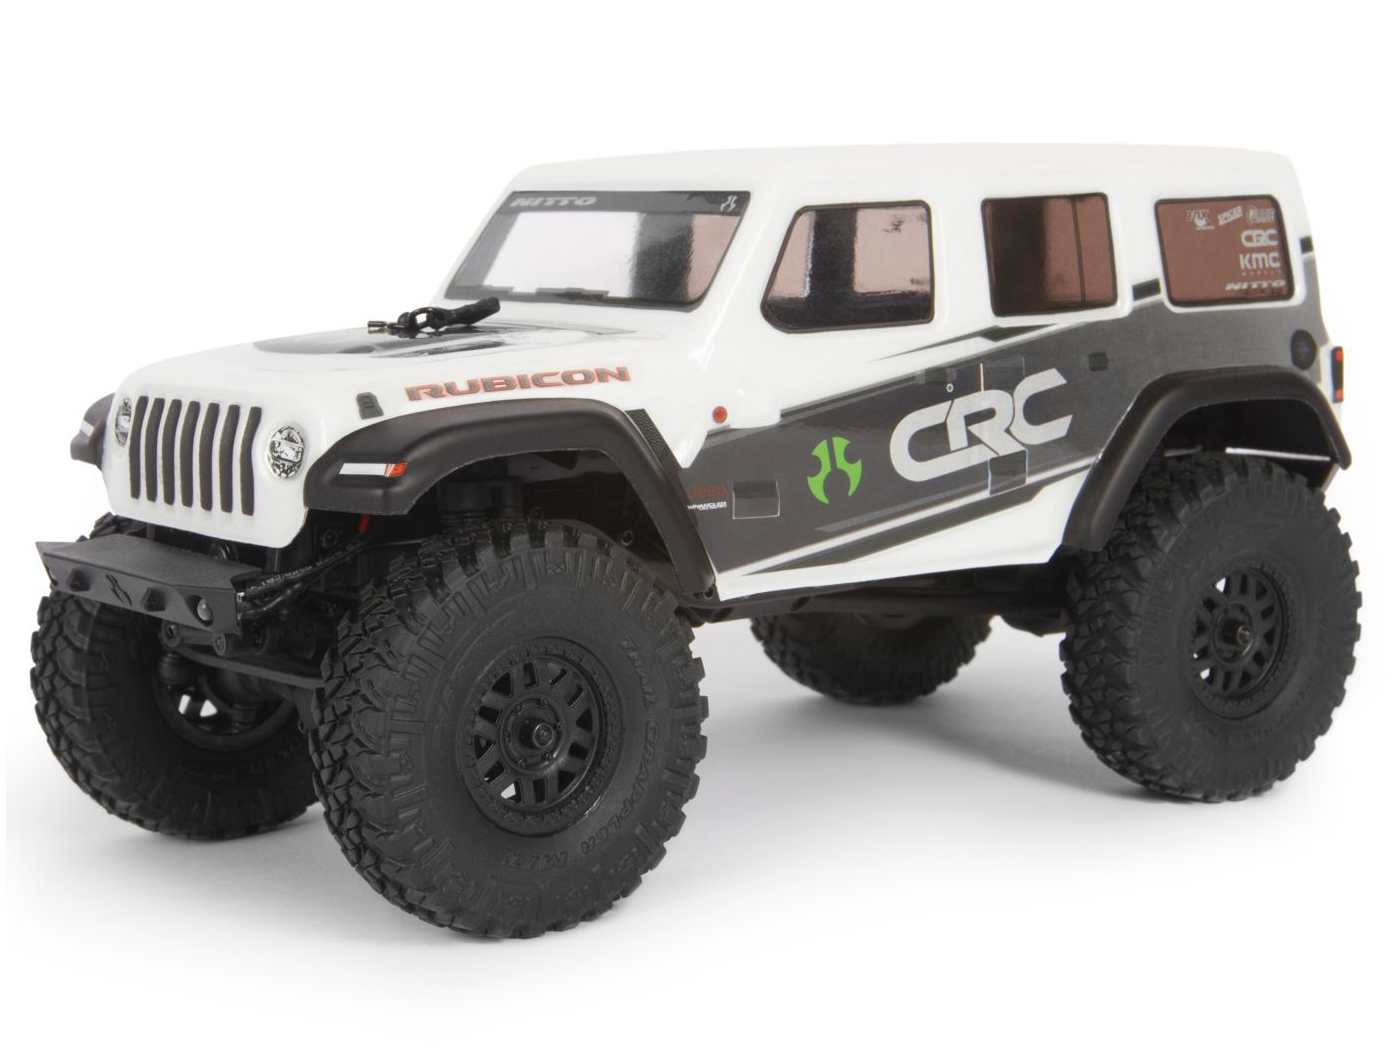 Axial SCX24 1/24 Jeep Wrangler JLU CRC RTR White